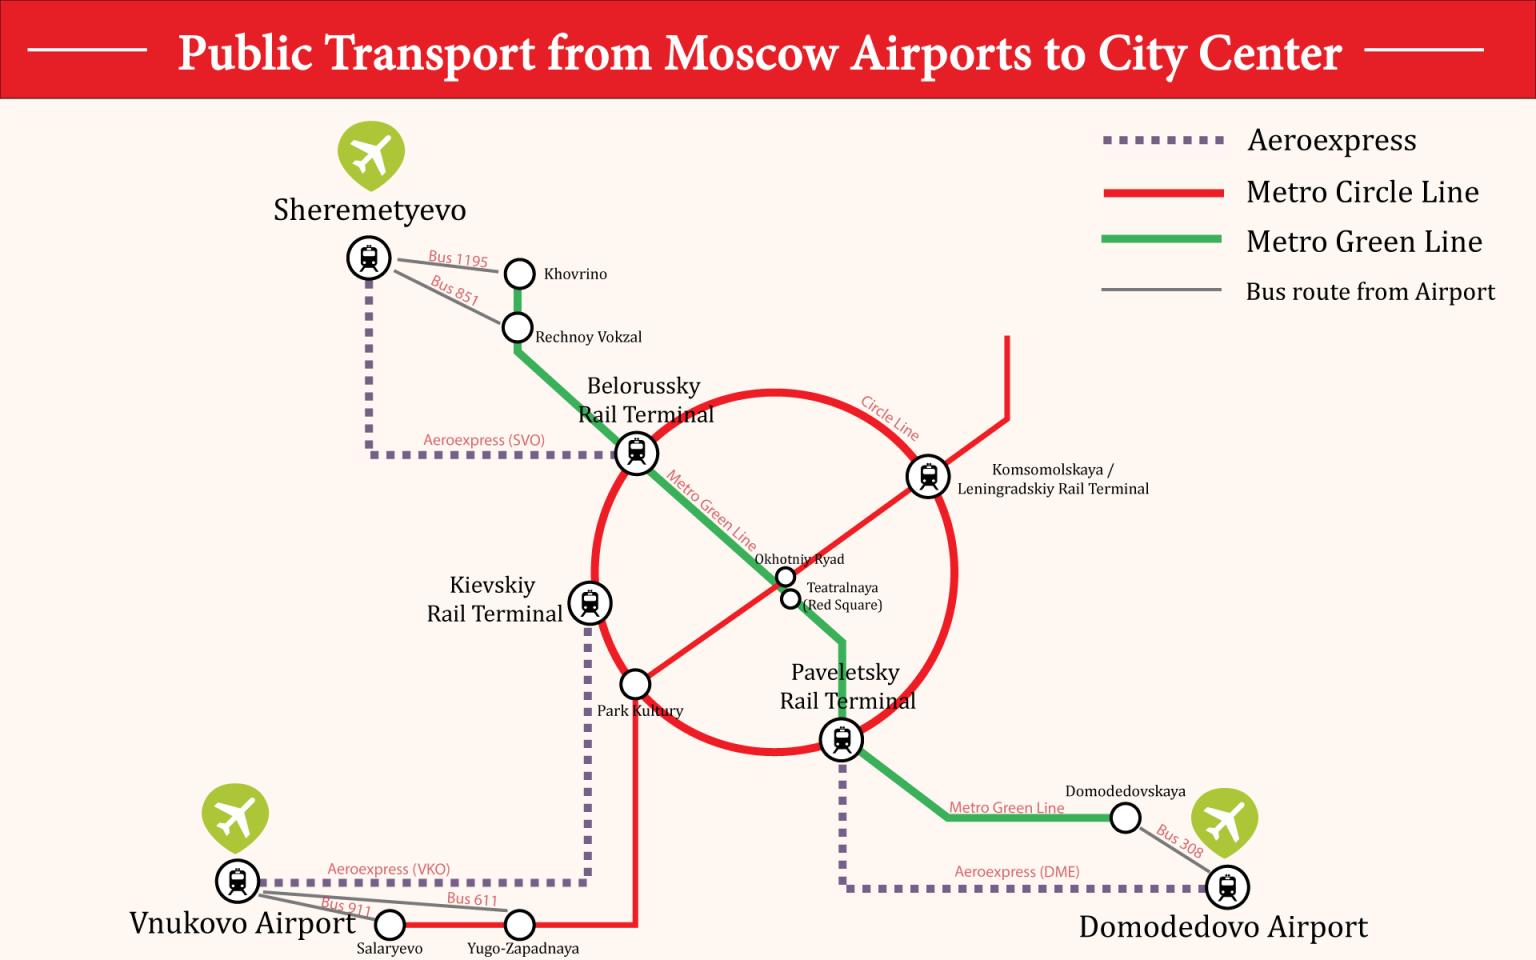 egyeni-utazo-aeroexpress-terkep-moszkva-oroszorszag-metro